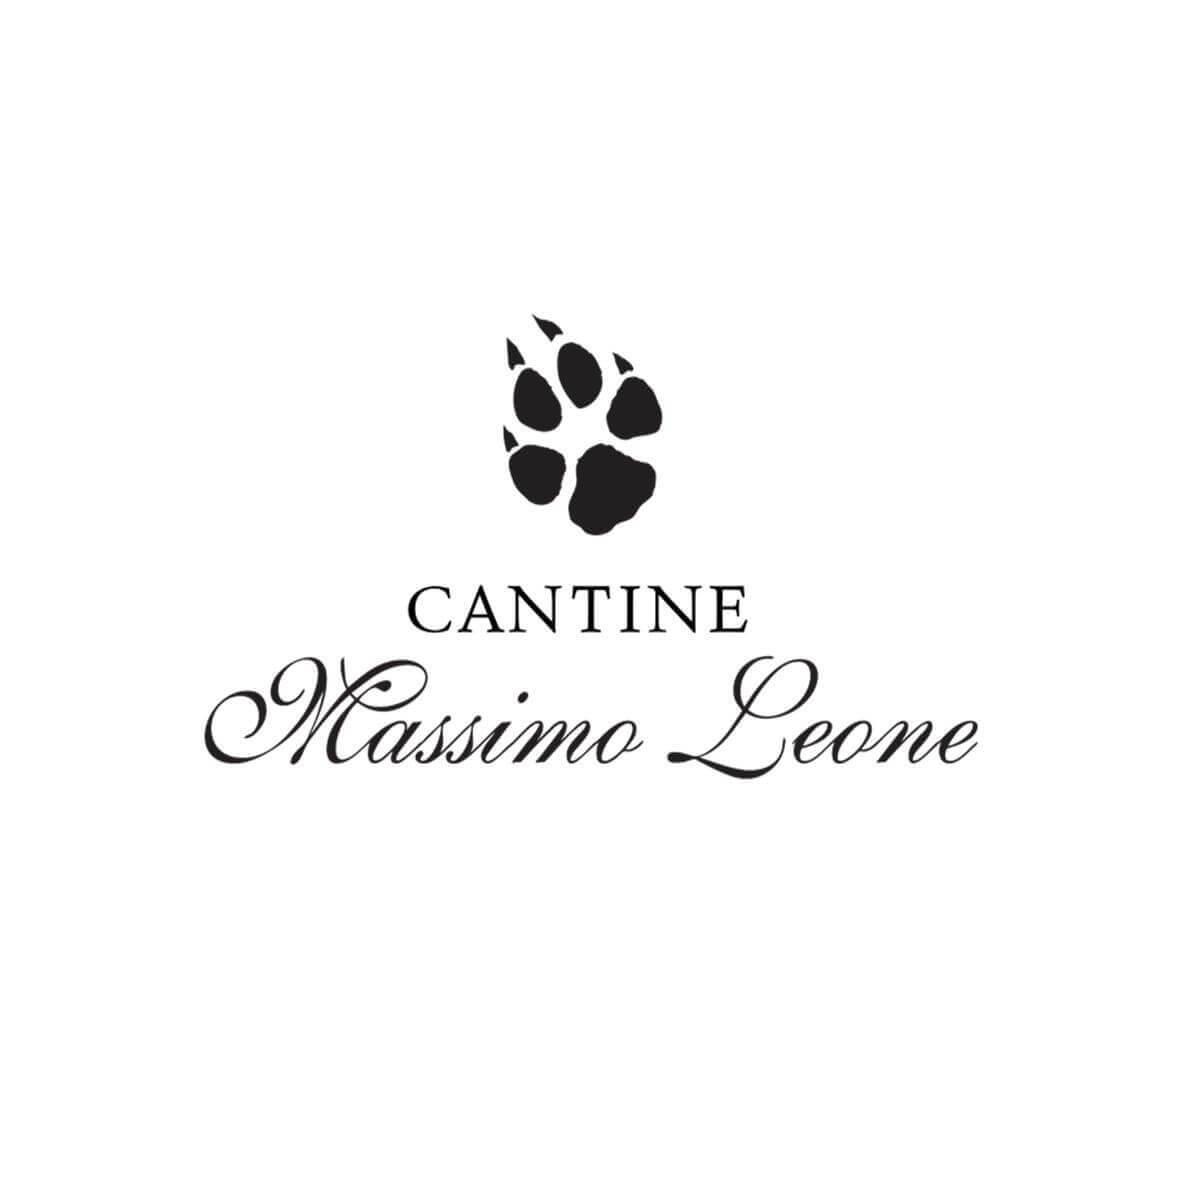 Cantine Massimo Leone